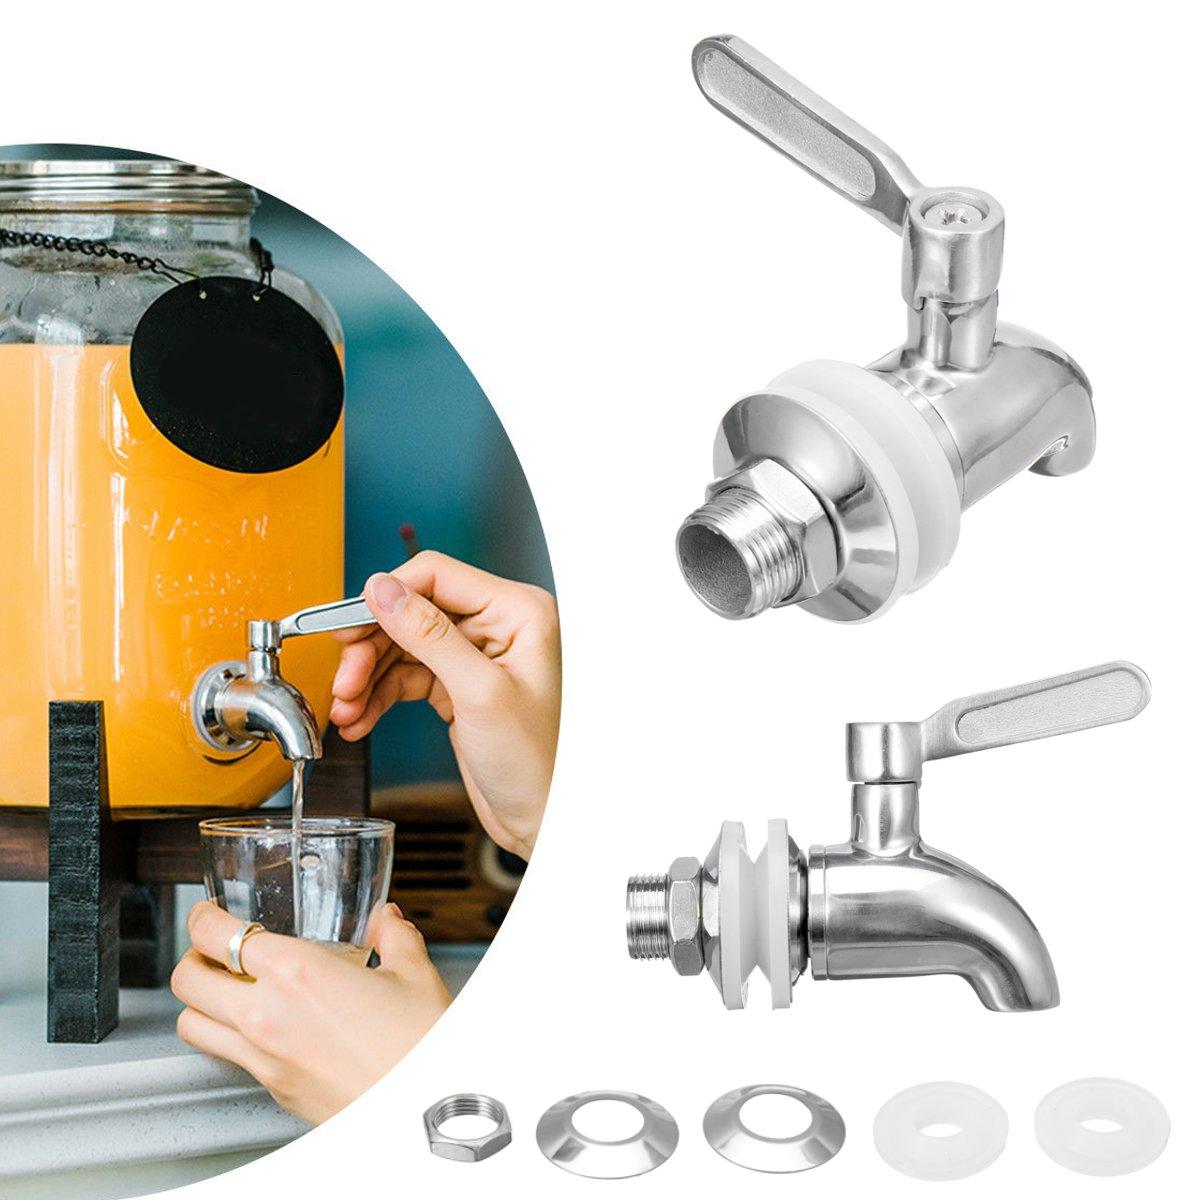 Wine Barrel Spigot Taps Stainless Steel Drink Beverage Dispenser Faucet Supply